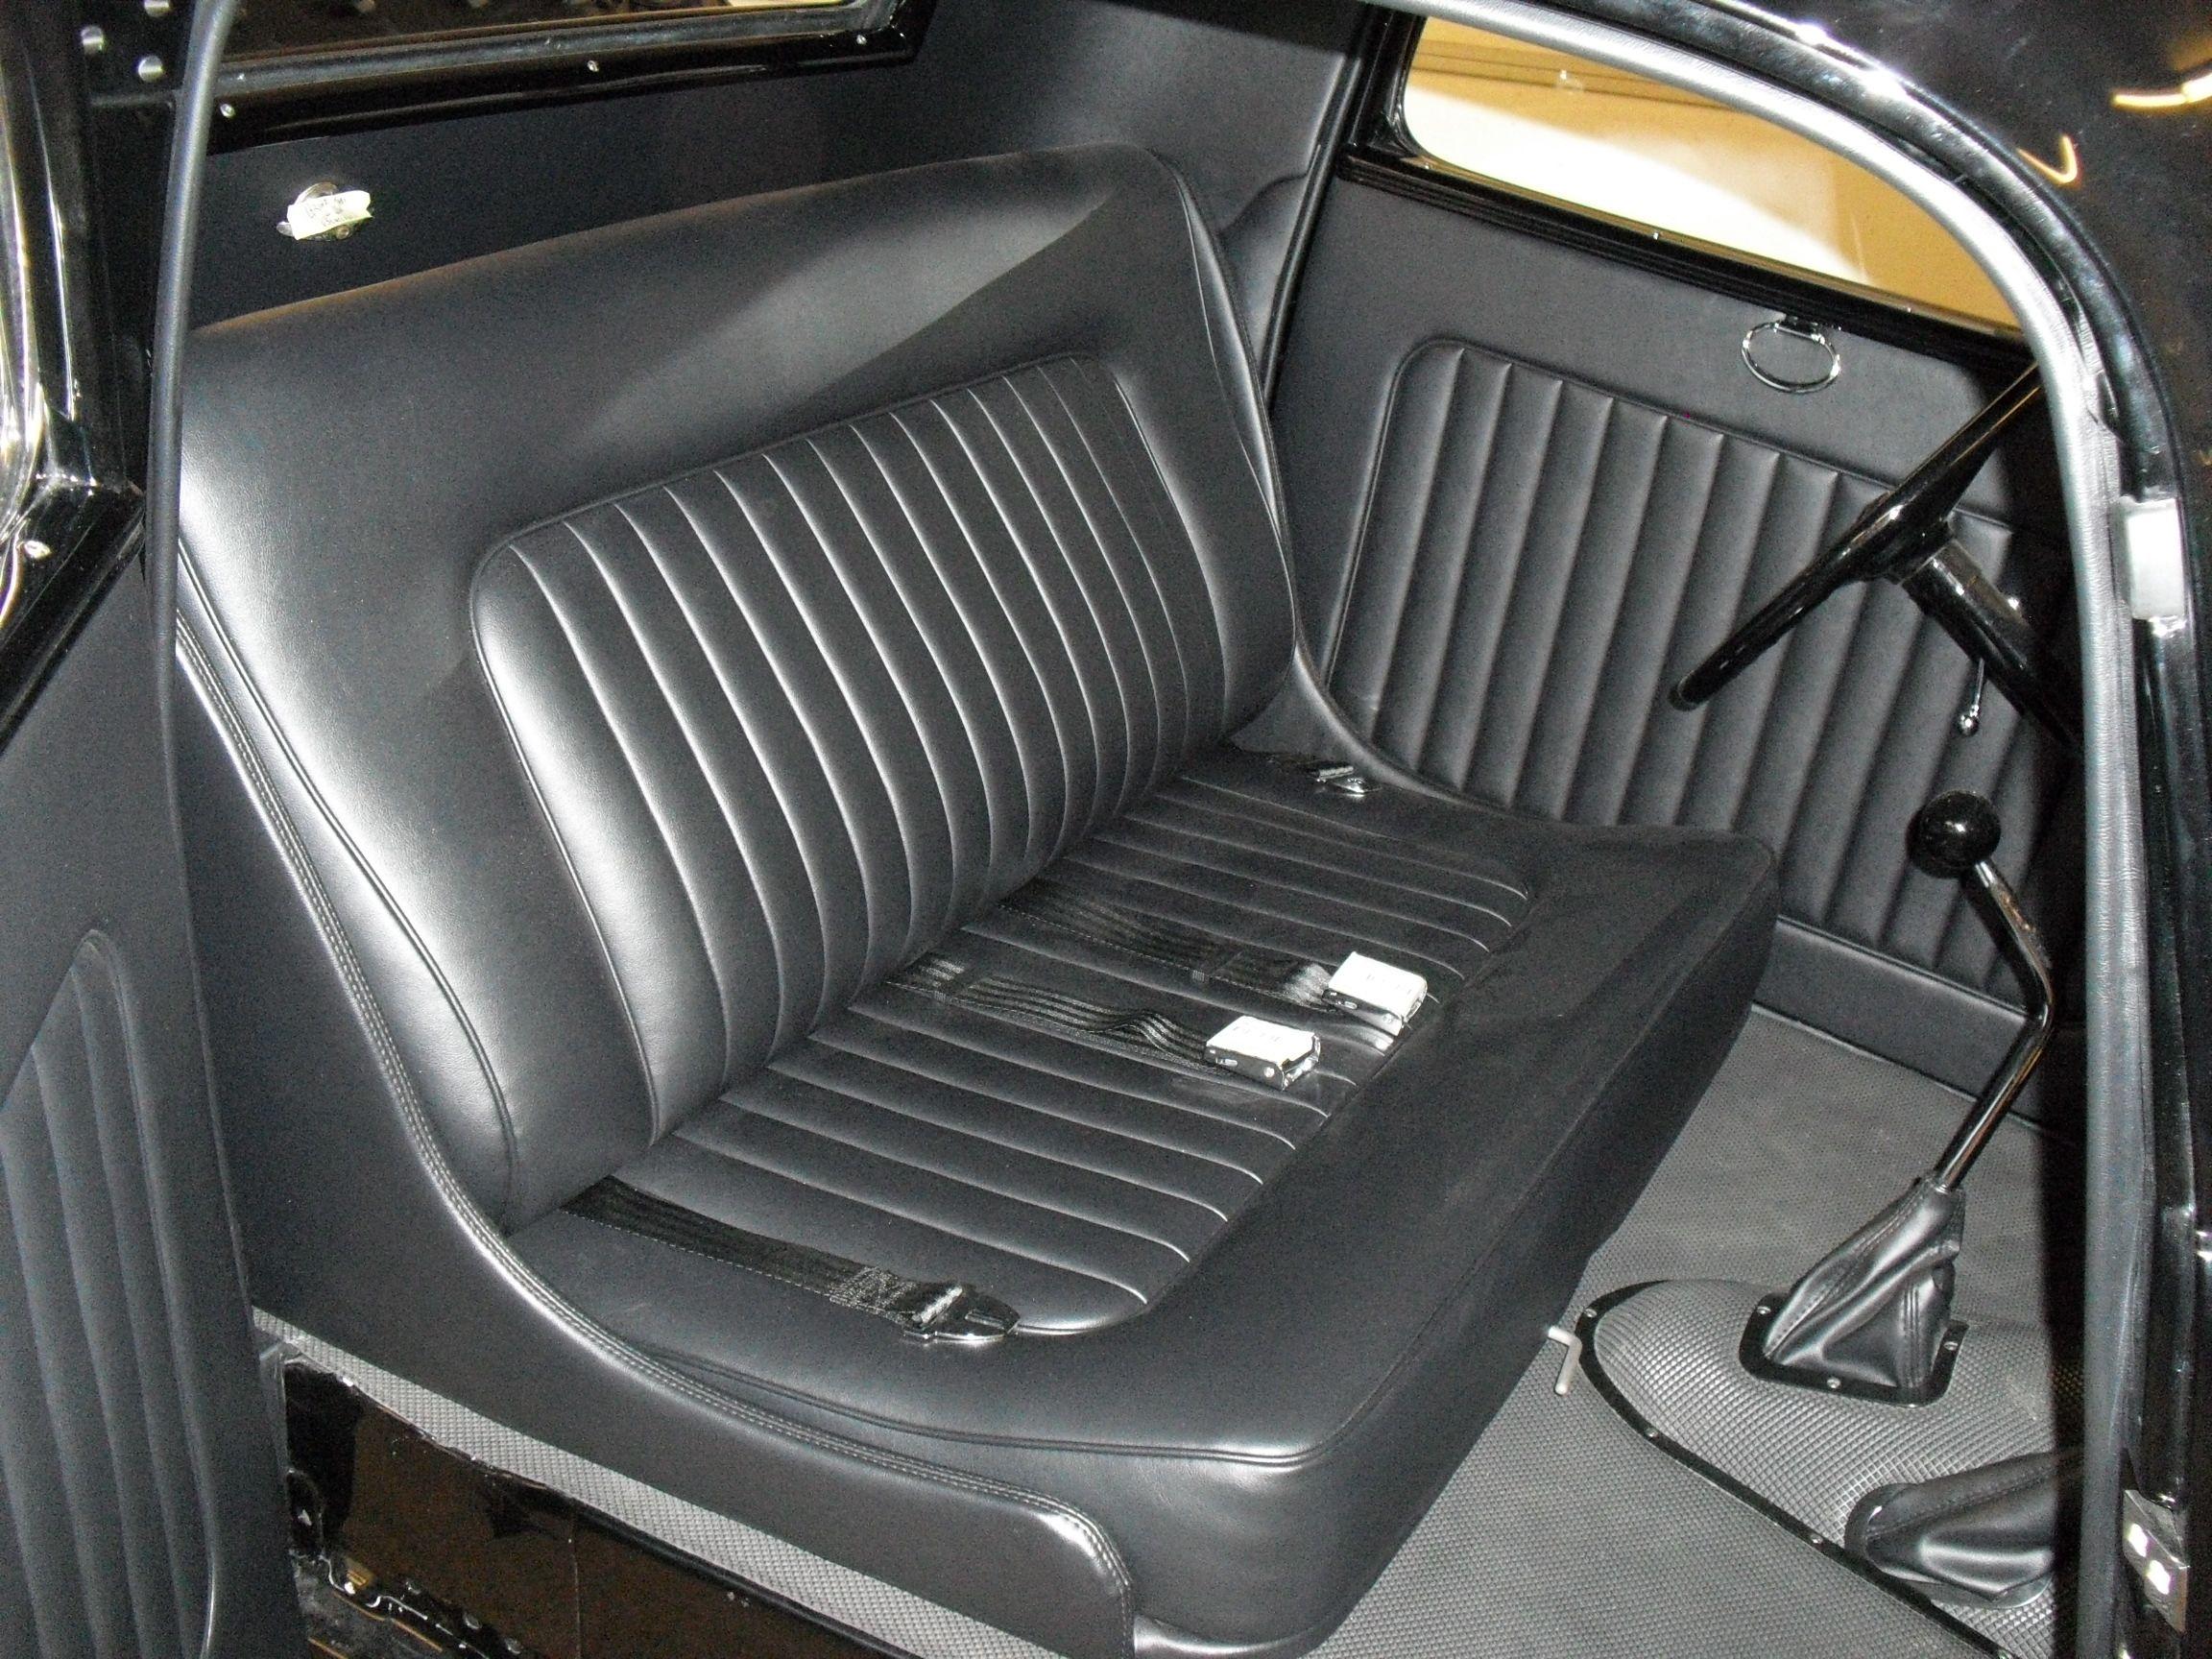 Tim Kirby 1933 Ford Coupestreet Rodder Scottsdale Top 100 Hot Rods By Dean Black Oldsmobile Rocket Interior Upholstery 3 Jpg 2 304 1 7 Hot Rods Interior Rodder